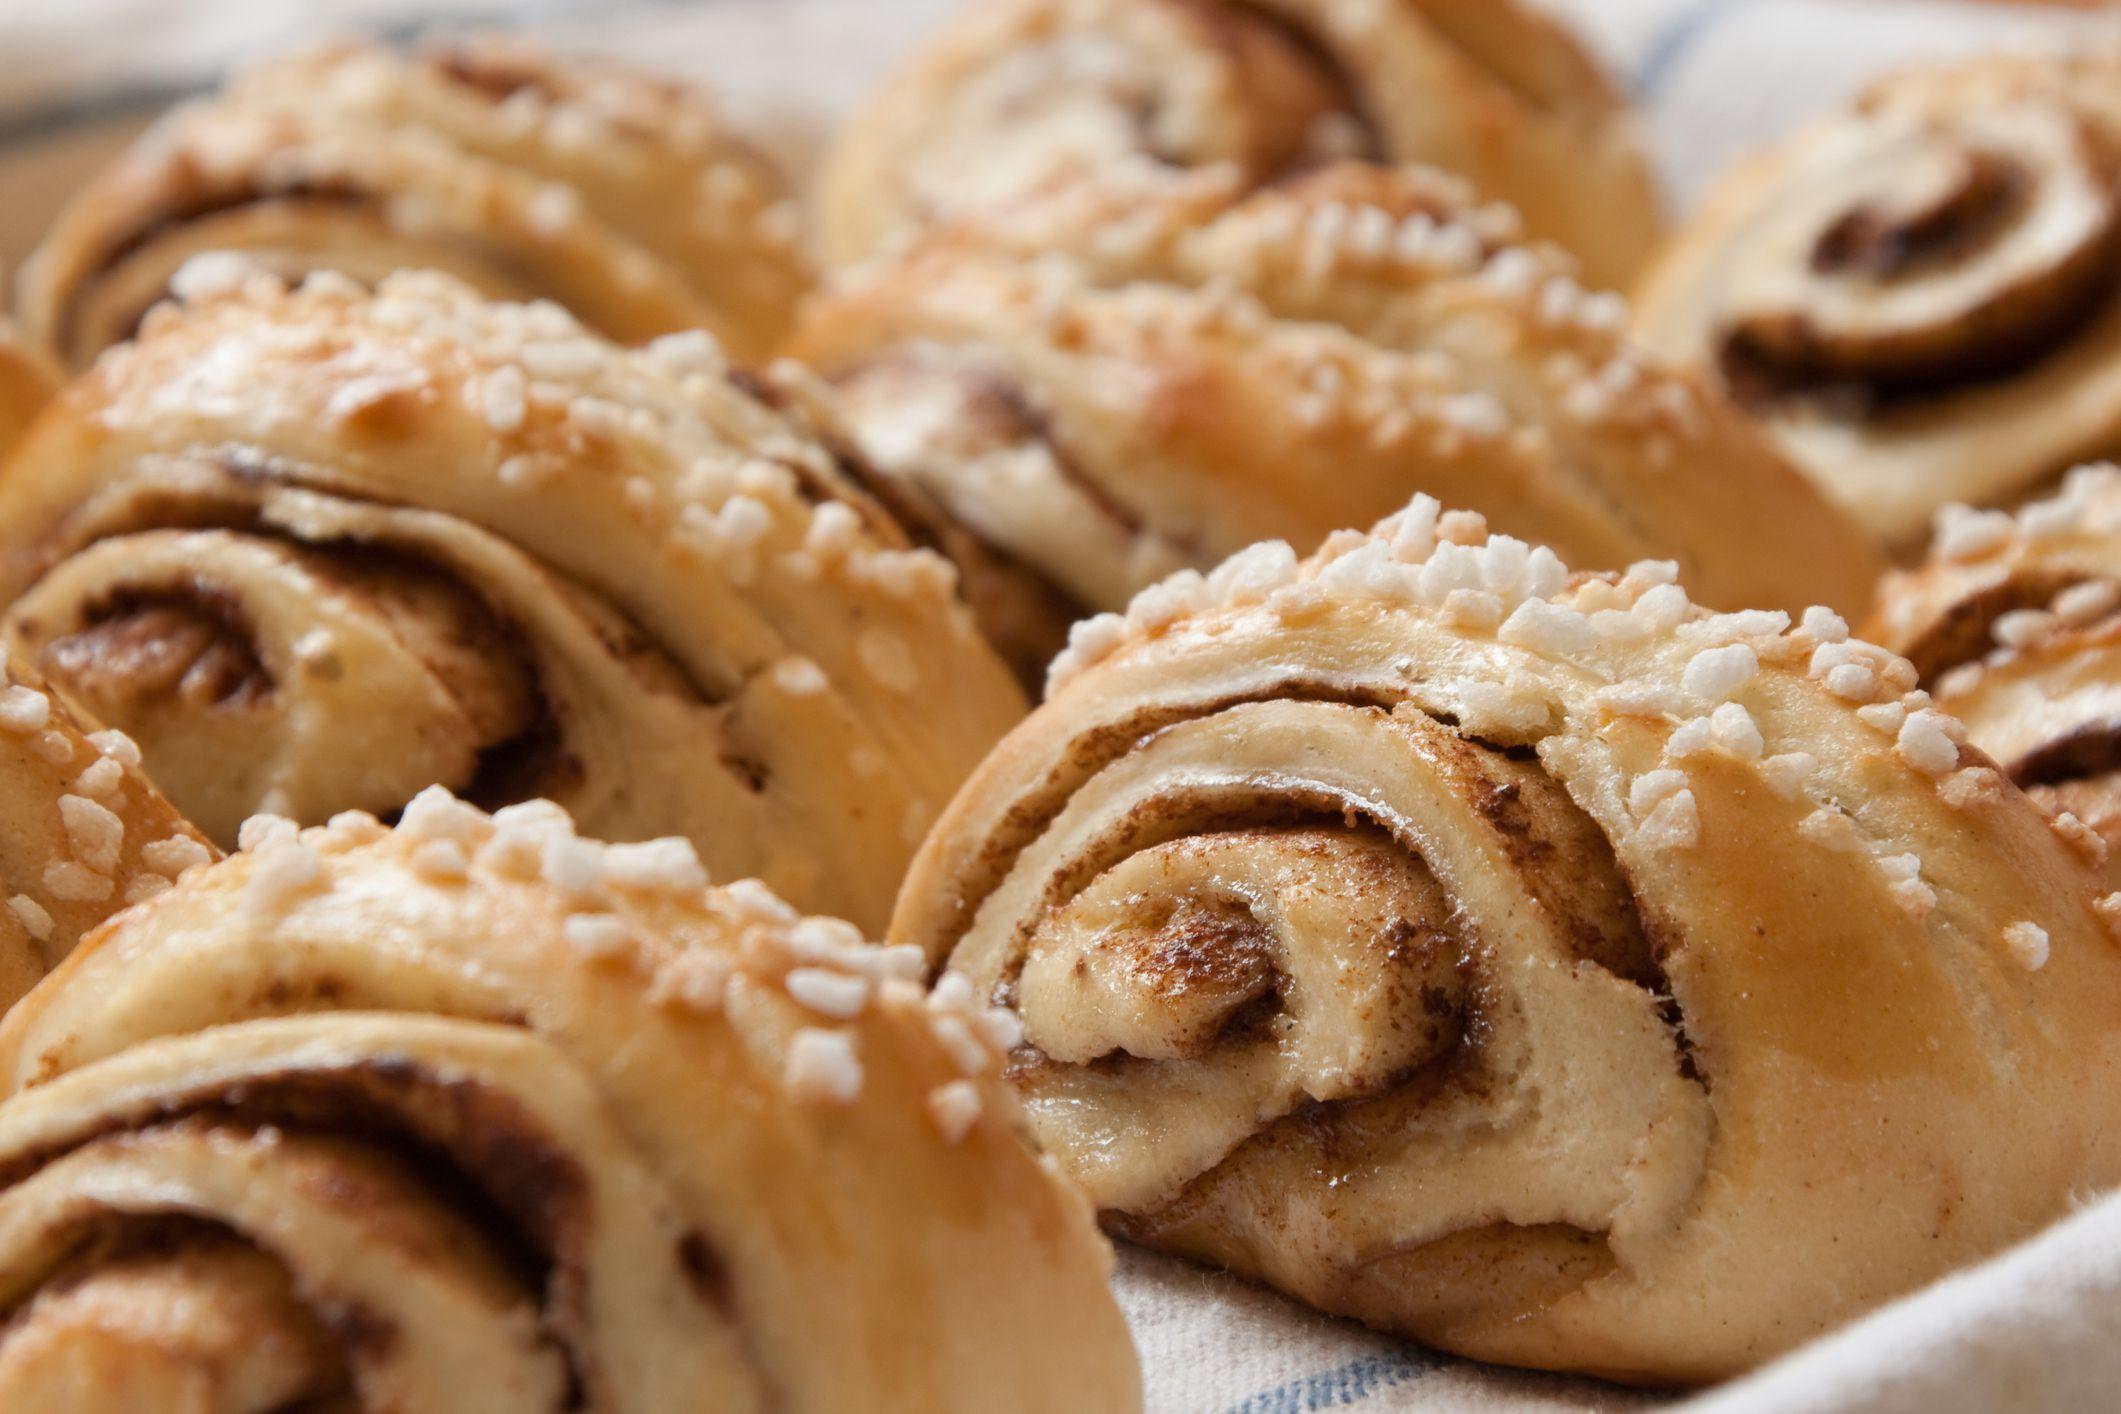 Recipe To Make Finnish Cinnamon Korvapuusti Pastries